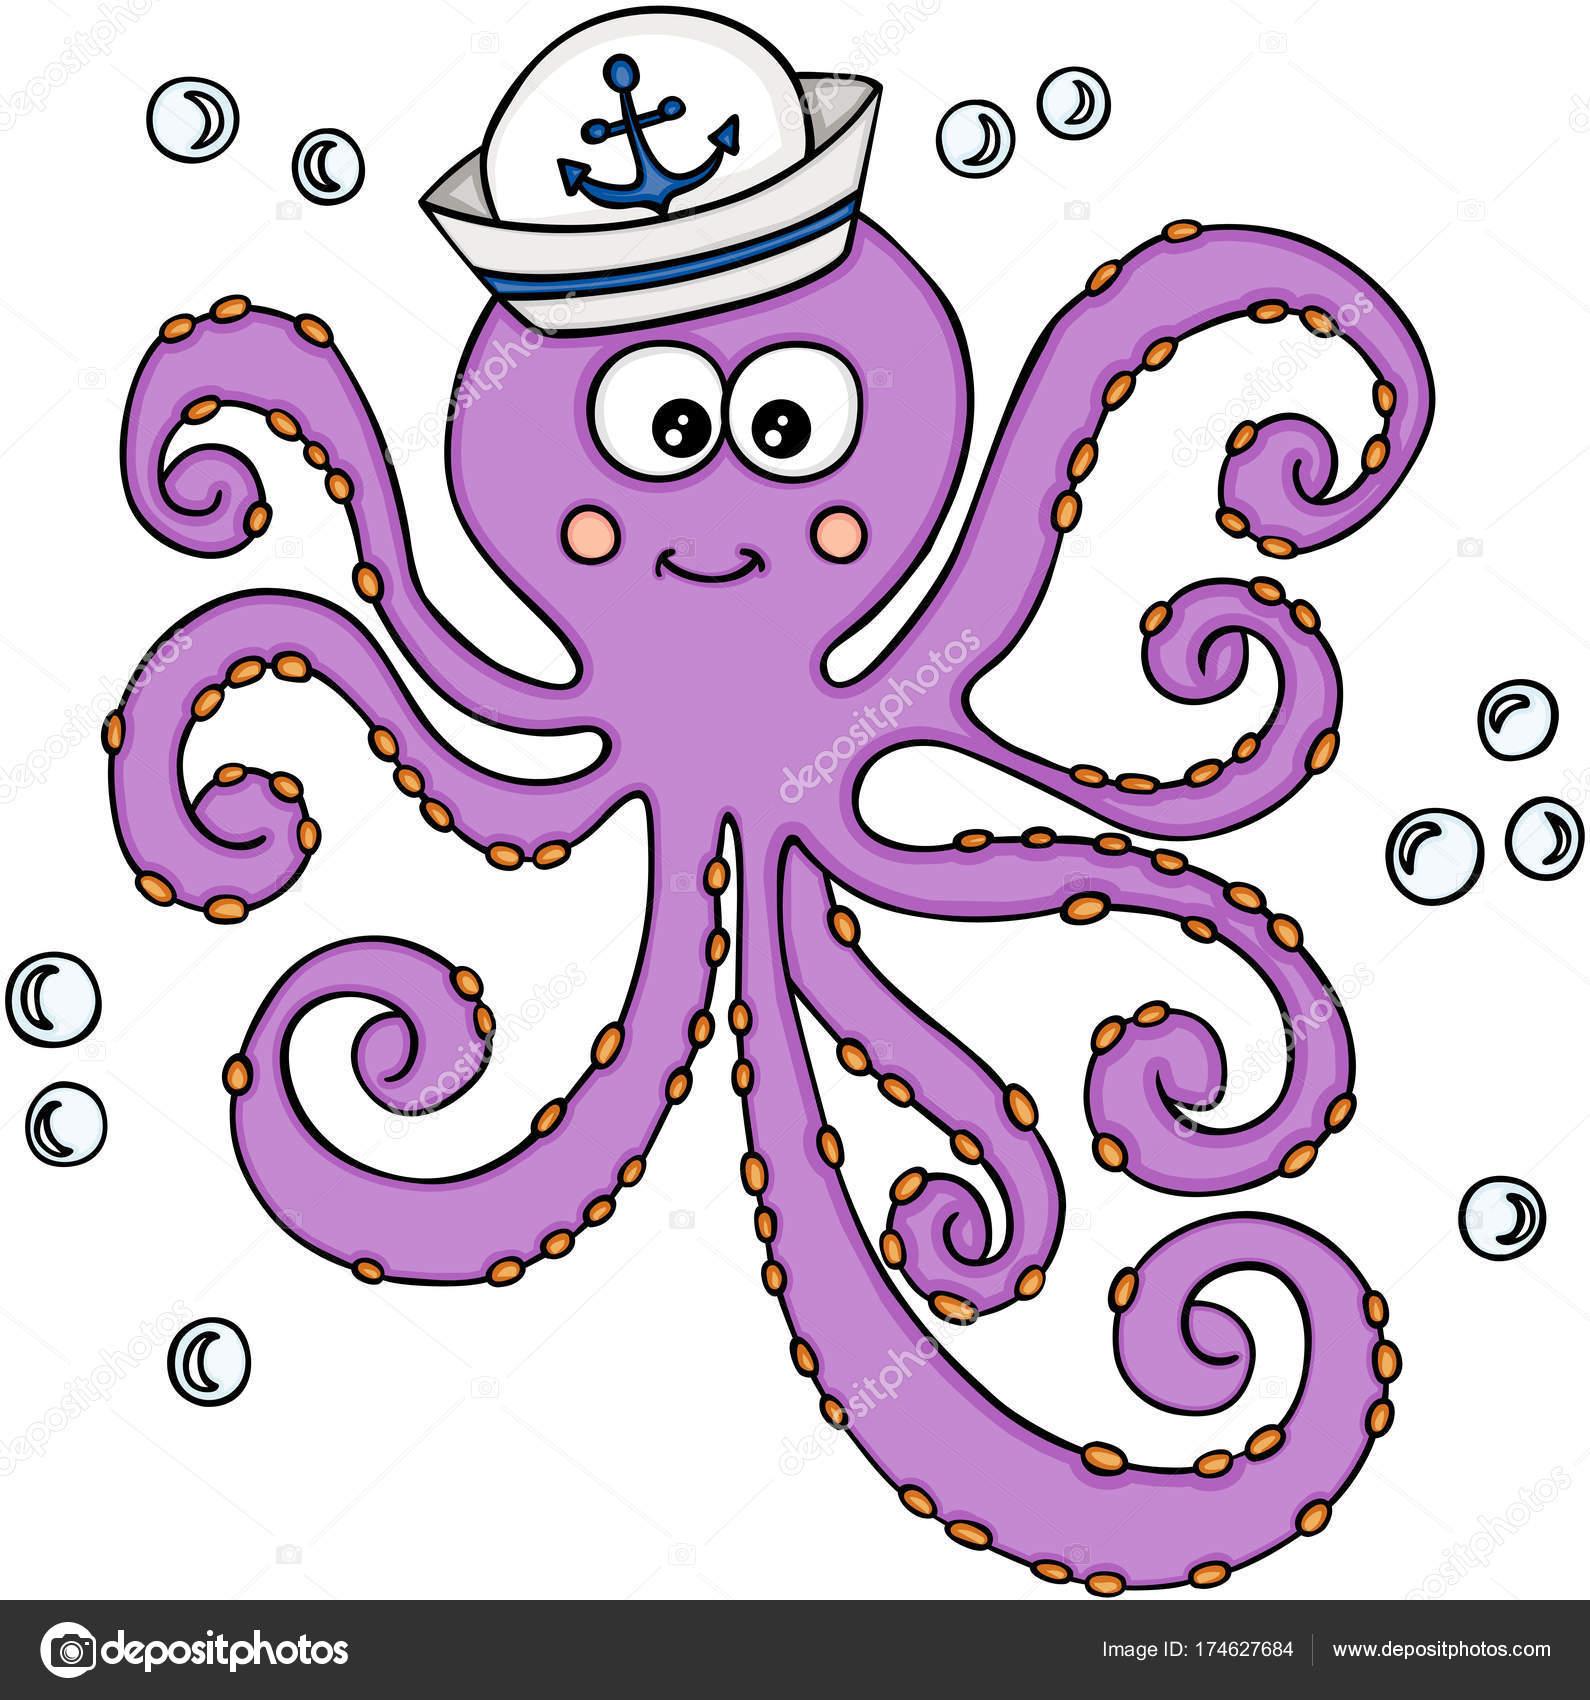 6a2abe59998b2 Imagen vectorial escalable que representa a un pulpo con sombrero de  marinero